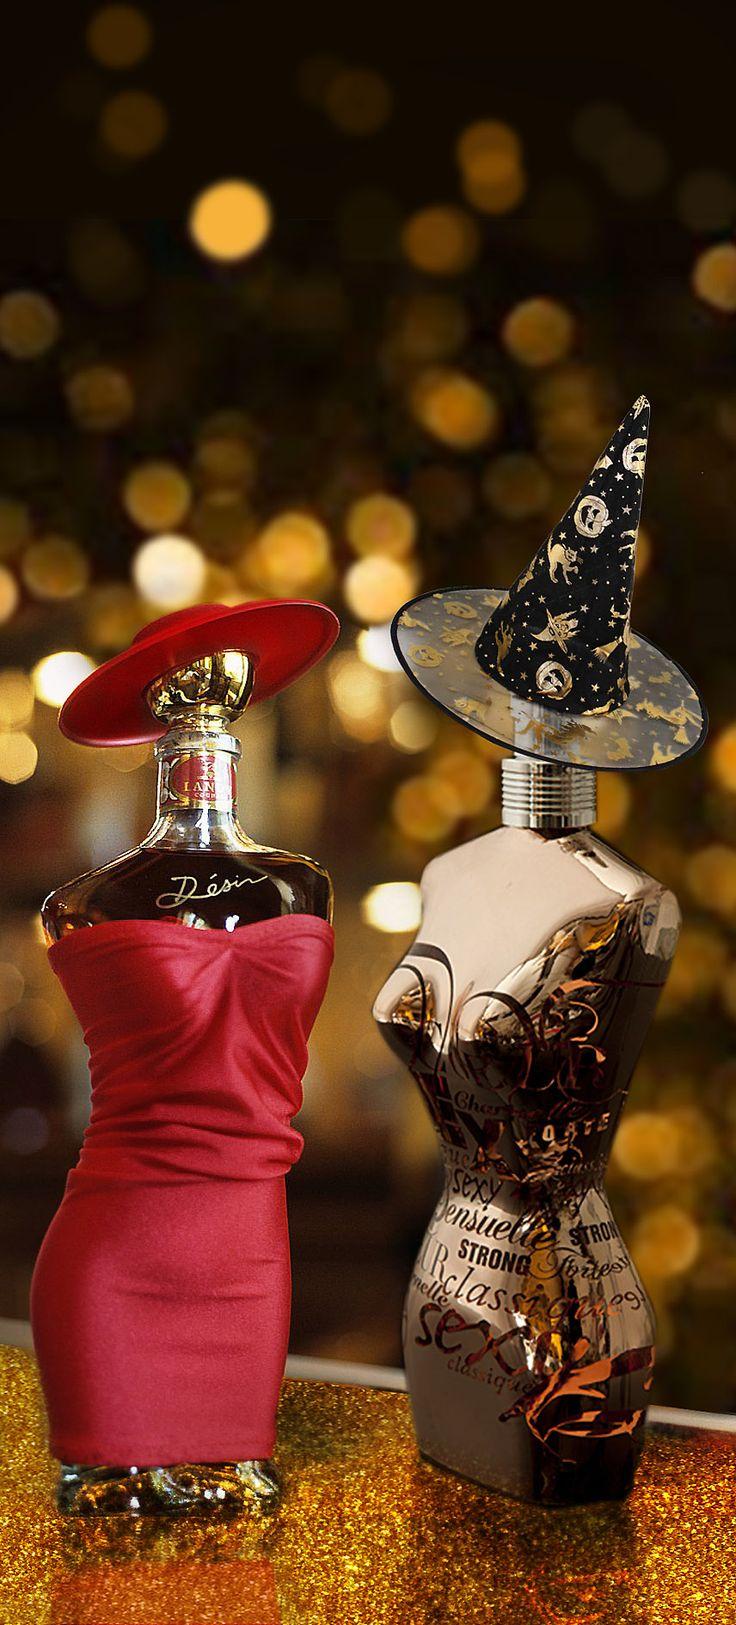 Landy Cognac Desire + Jean Paul Gaultier+ anbenna :)